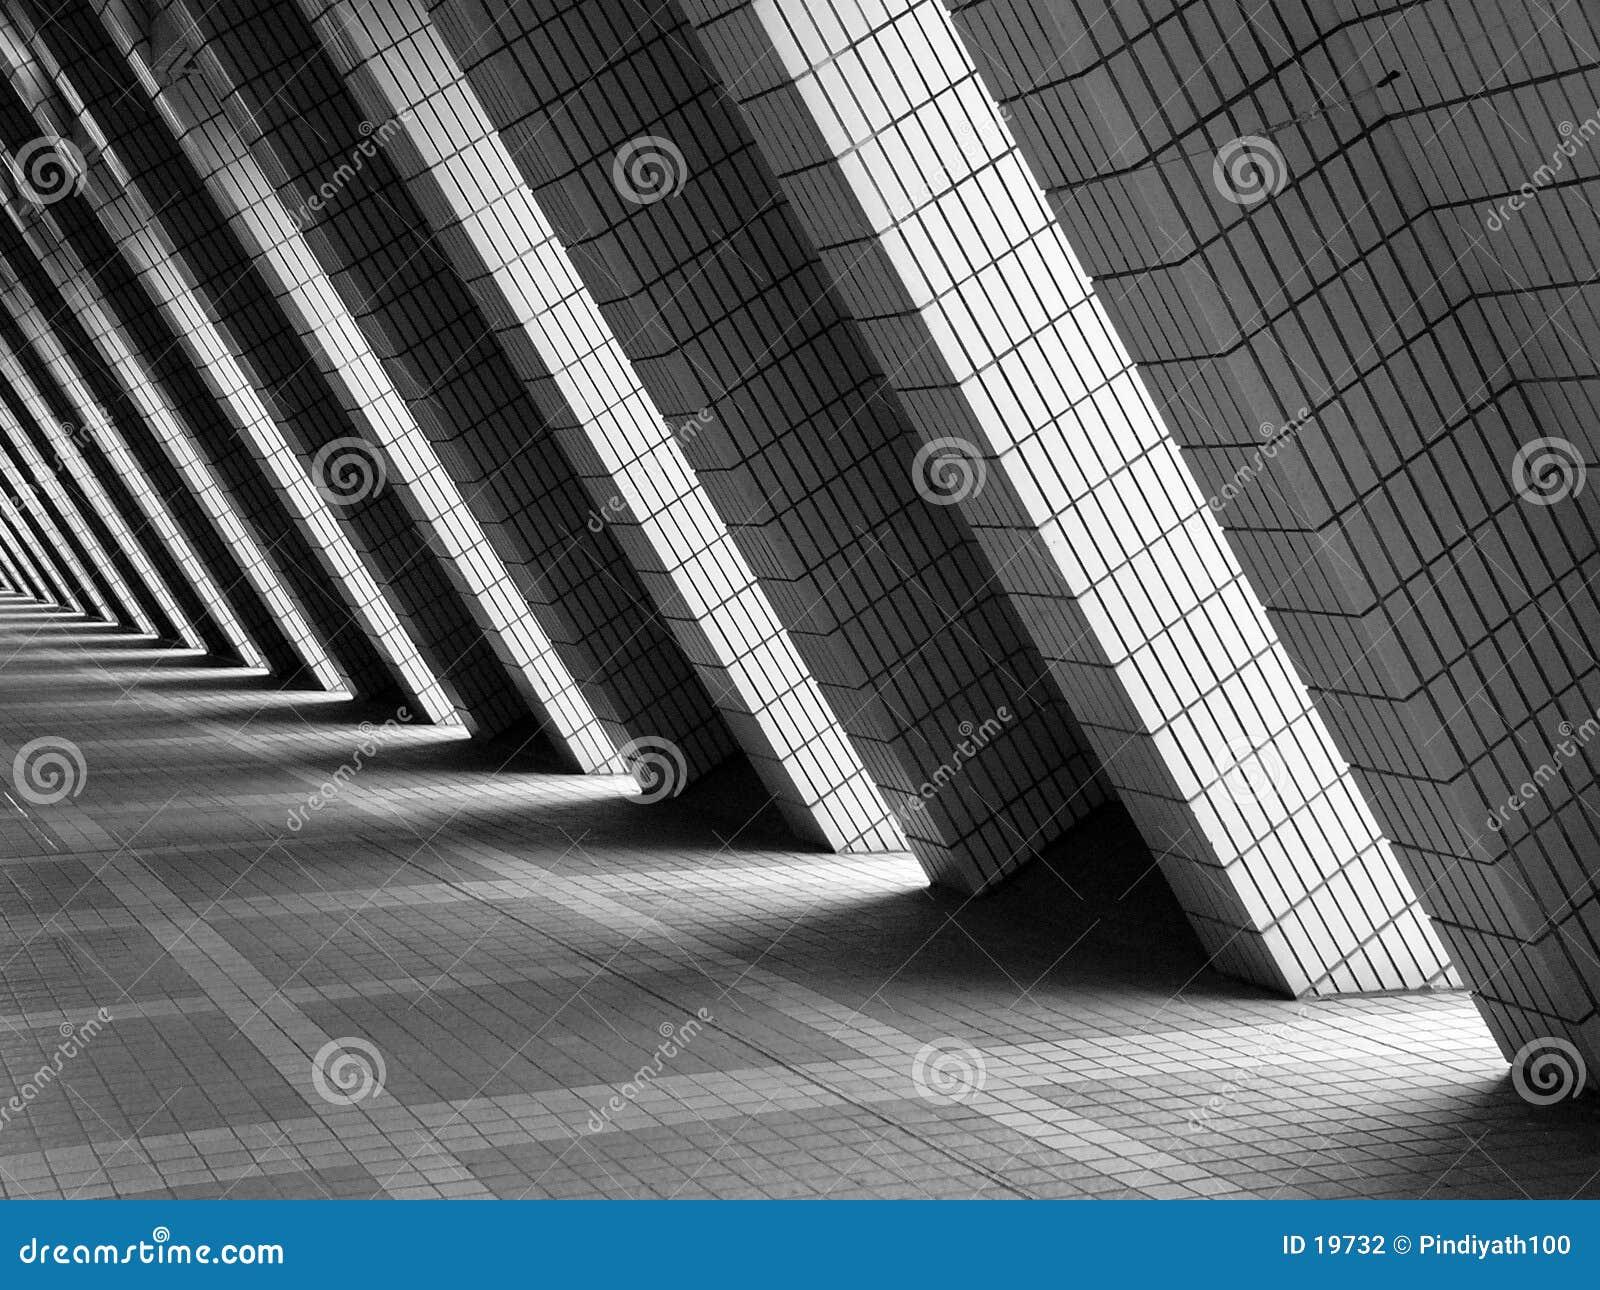 The brick walkway architecture pattern